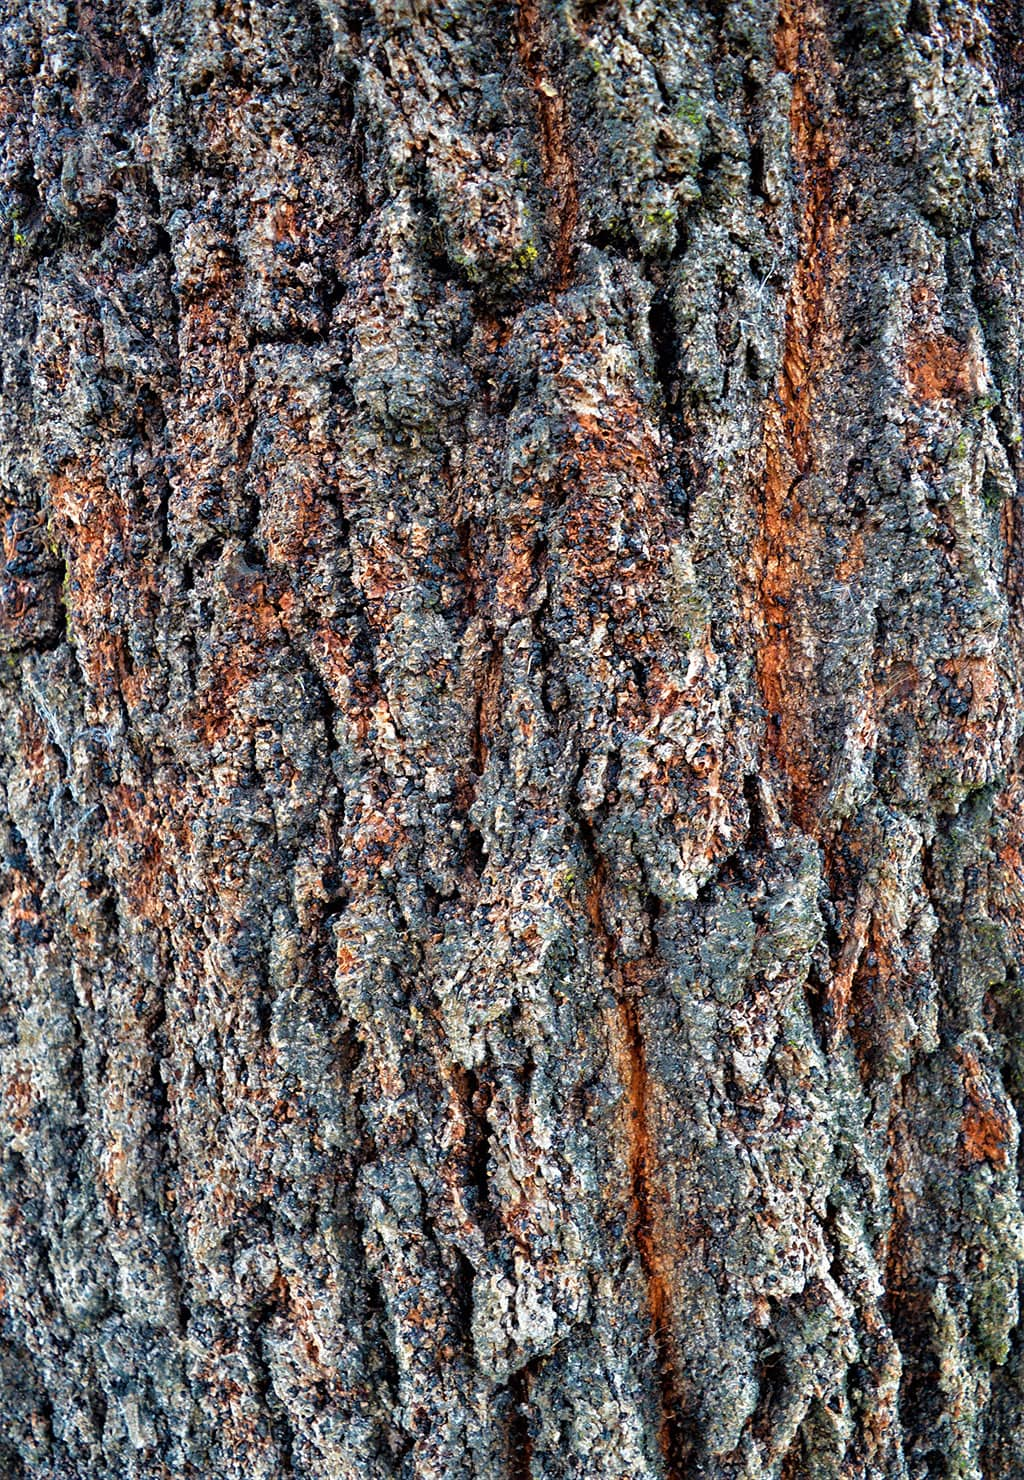 Red Ironwood - Eucalyptus Bark photo by David Gress